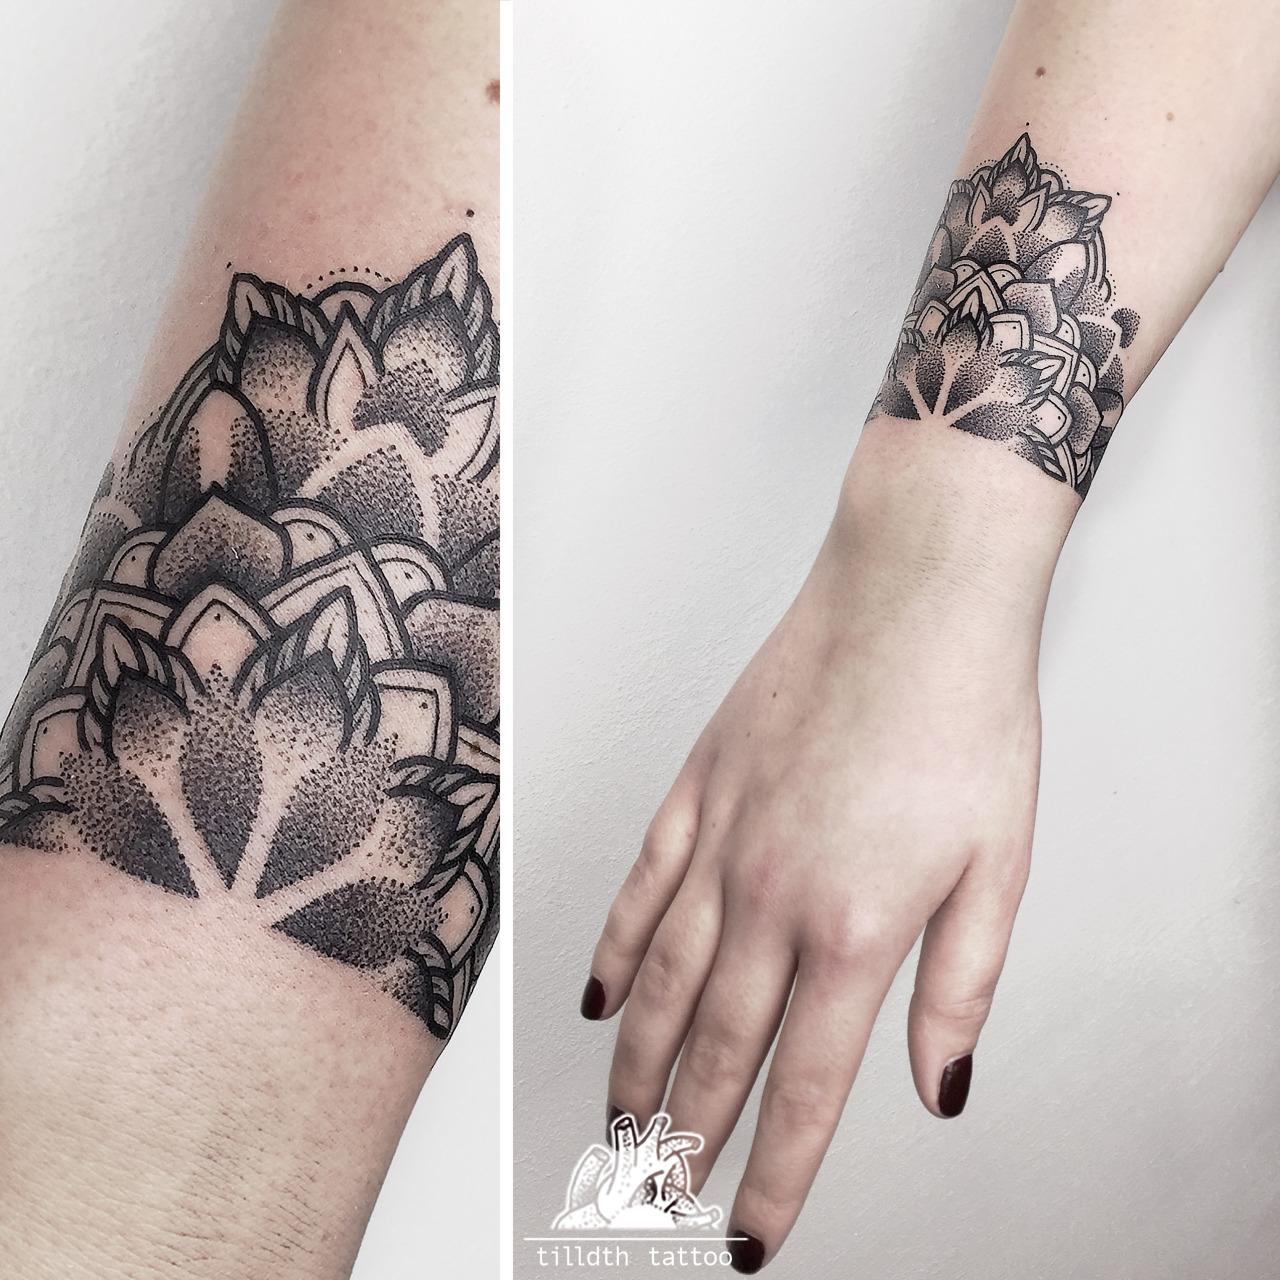 Tilldth Tattoo - the vandallist (12)